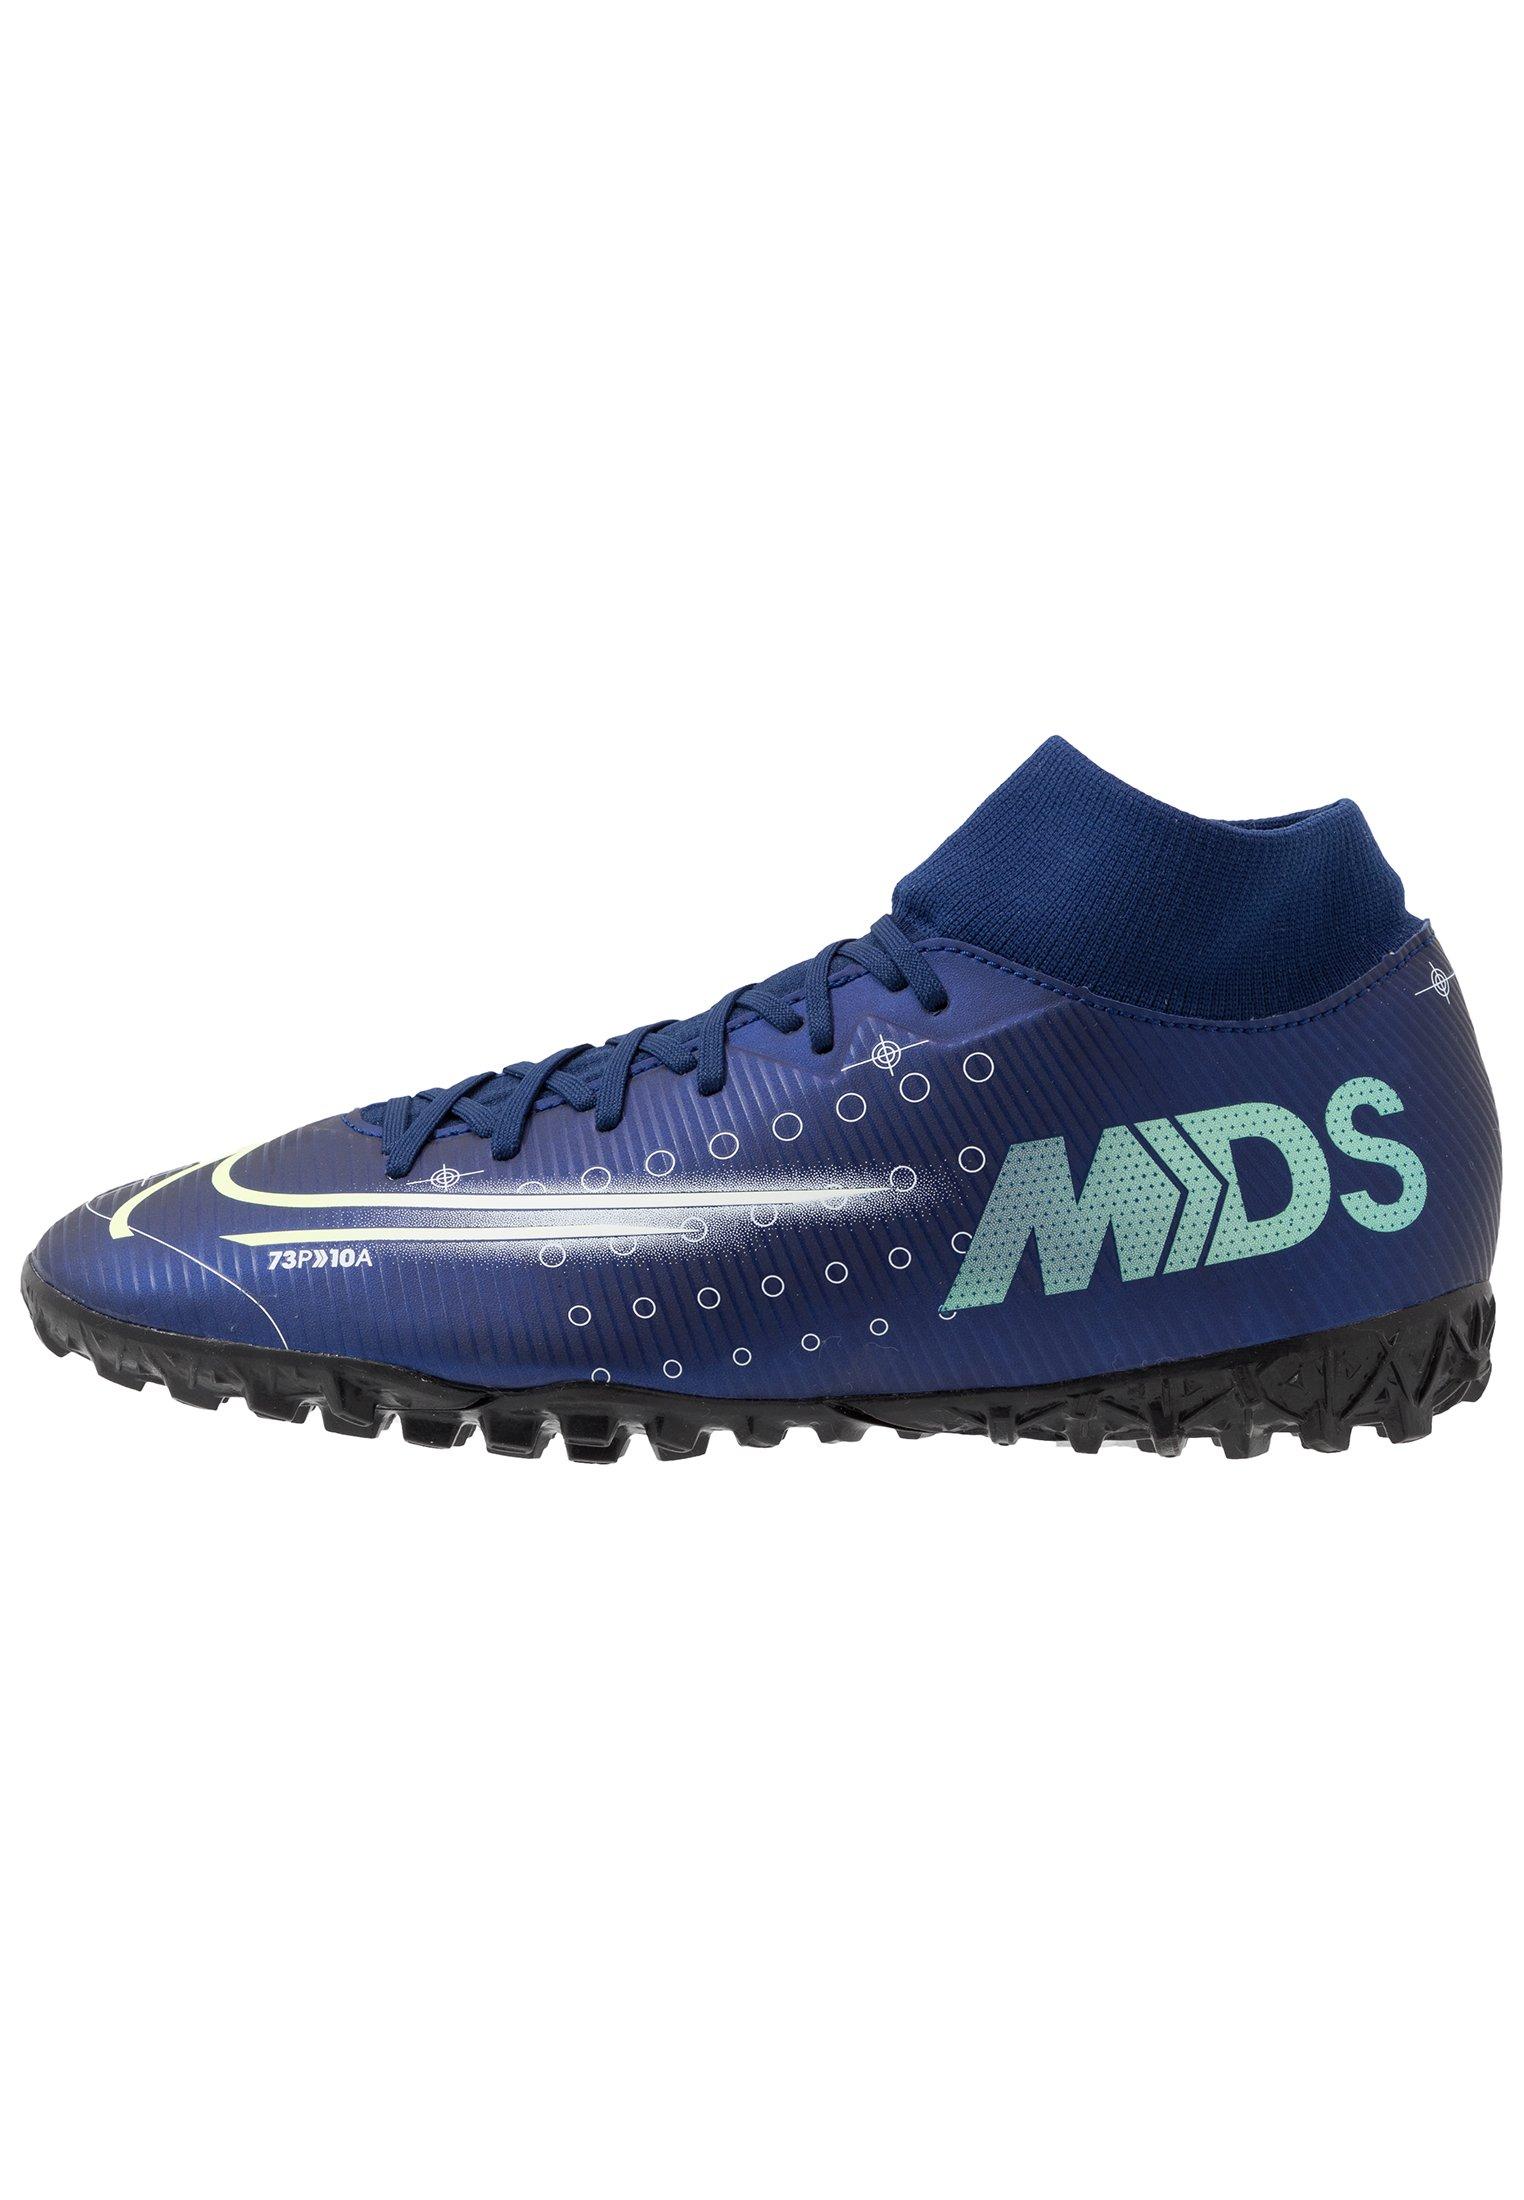 MERCURIAL 7 ACADEMY MDS TF Chaussures de foot multicrampons blue voidmetalic silverwhiteblack